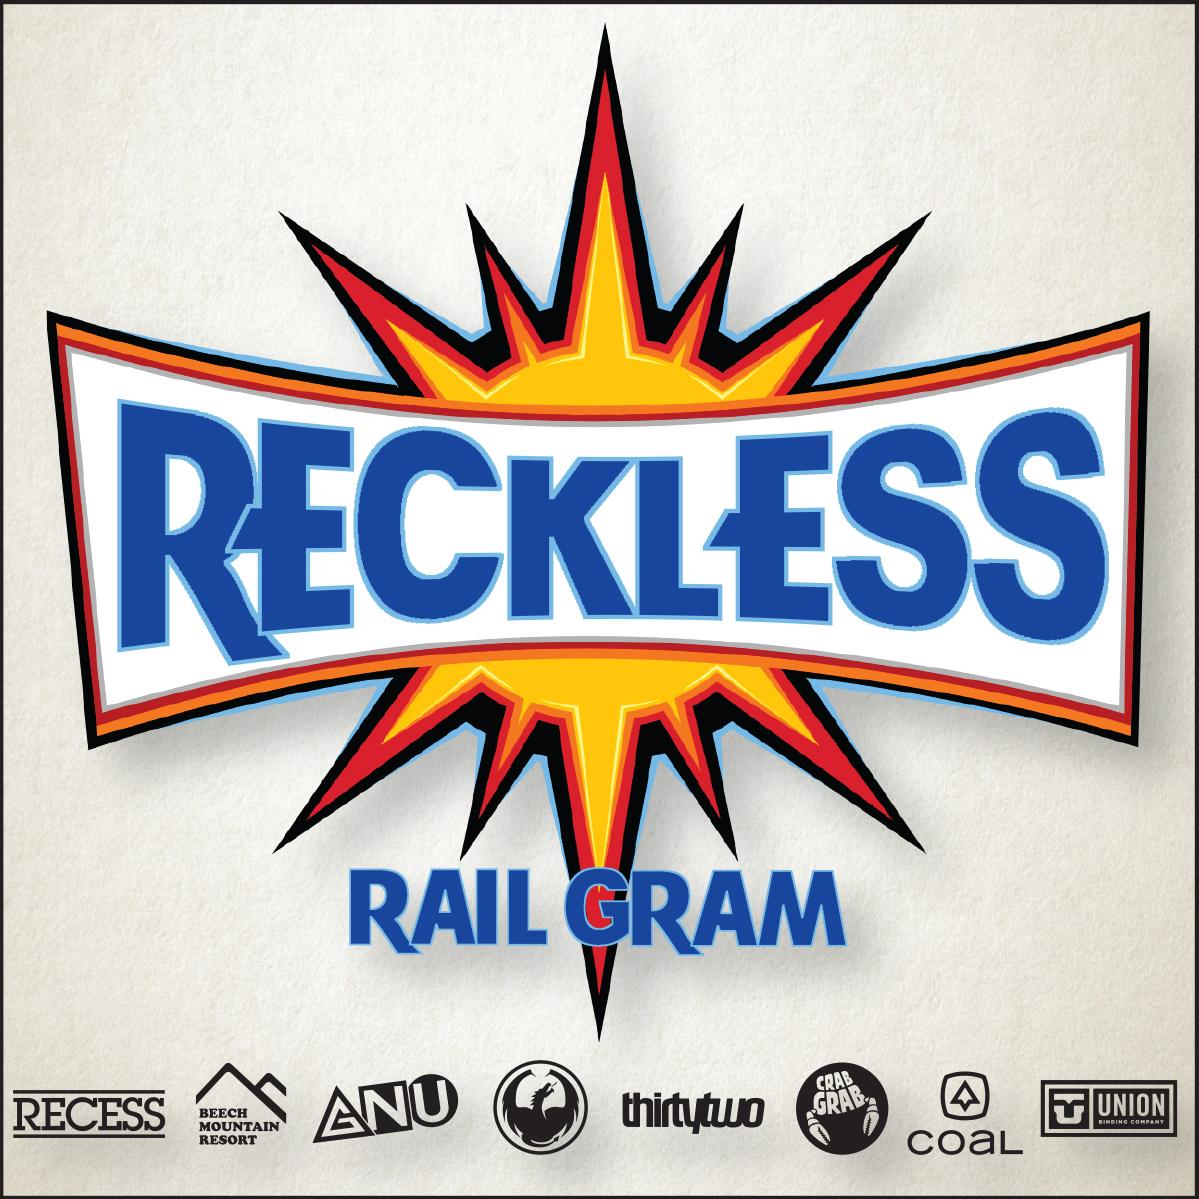 Reckless Rail Gram